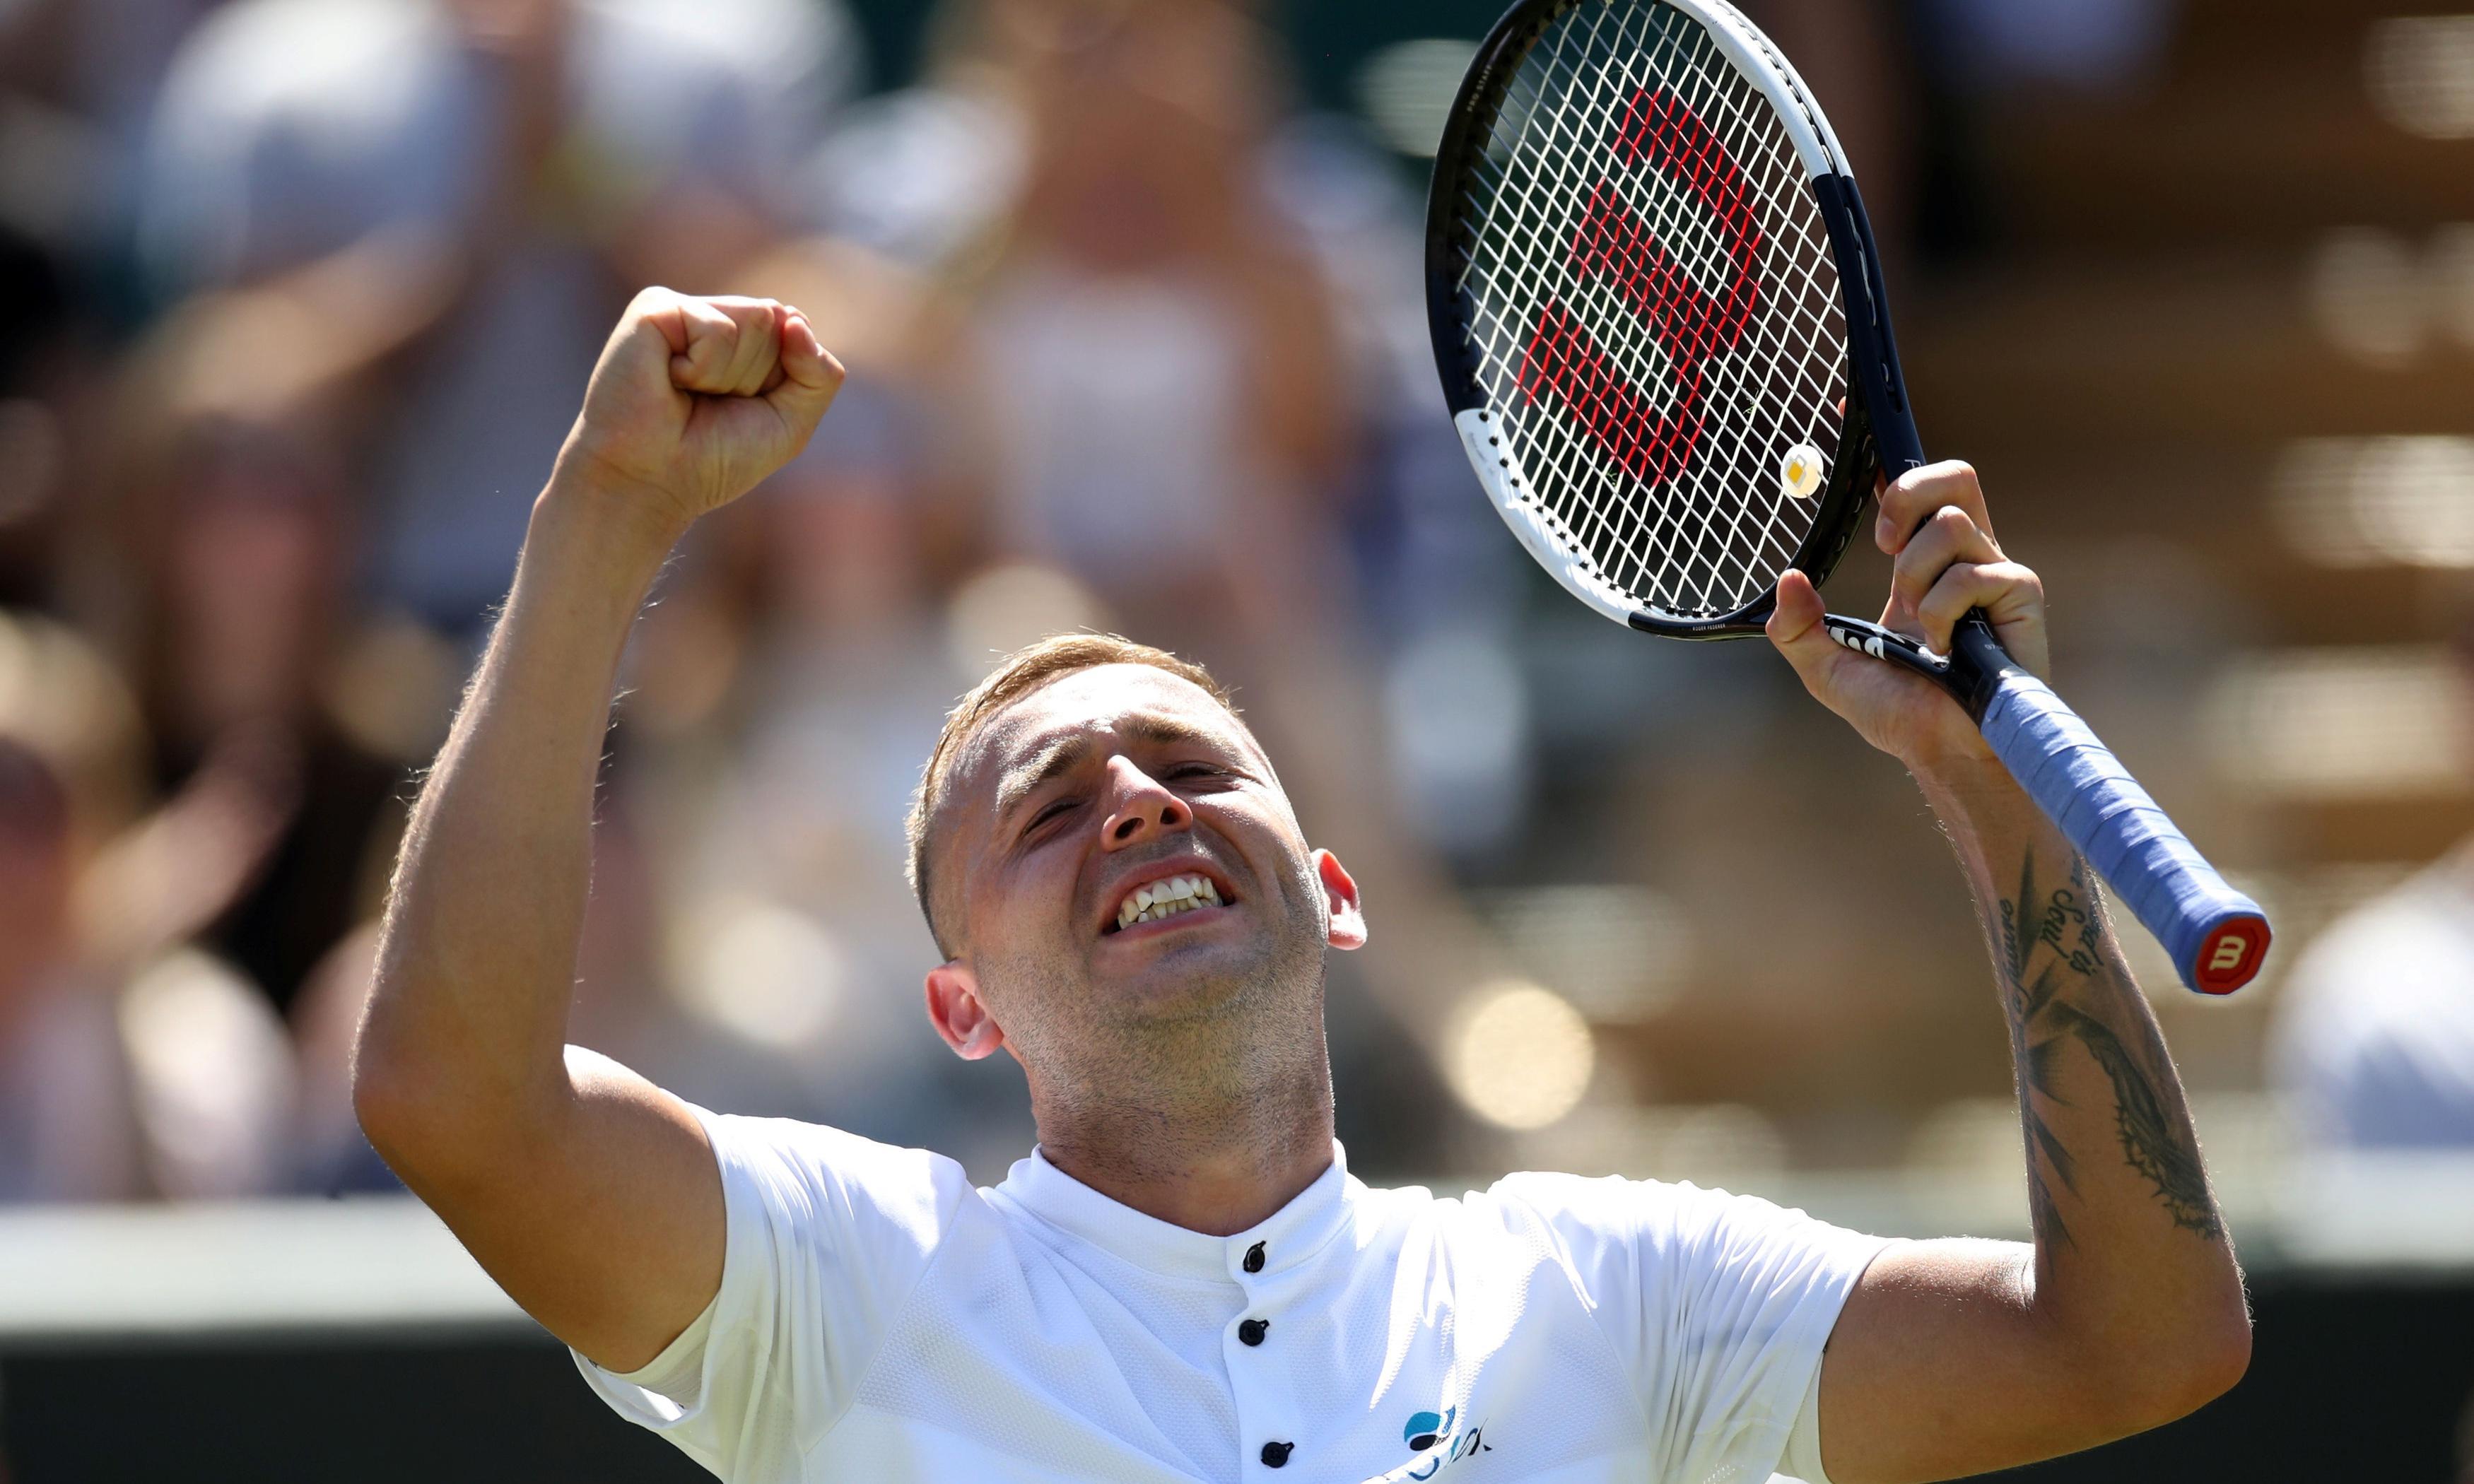 Emotional Dan Evans beats Basilashvili to reach Wimbledon third round